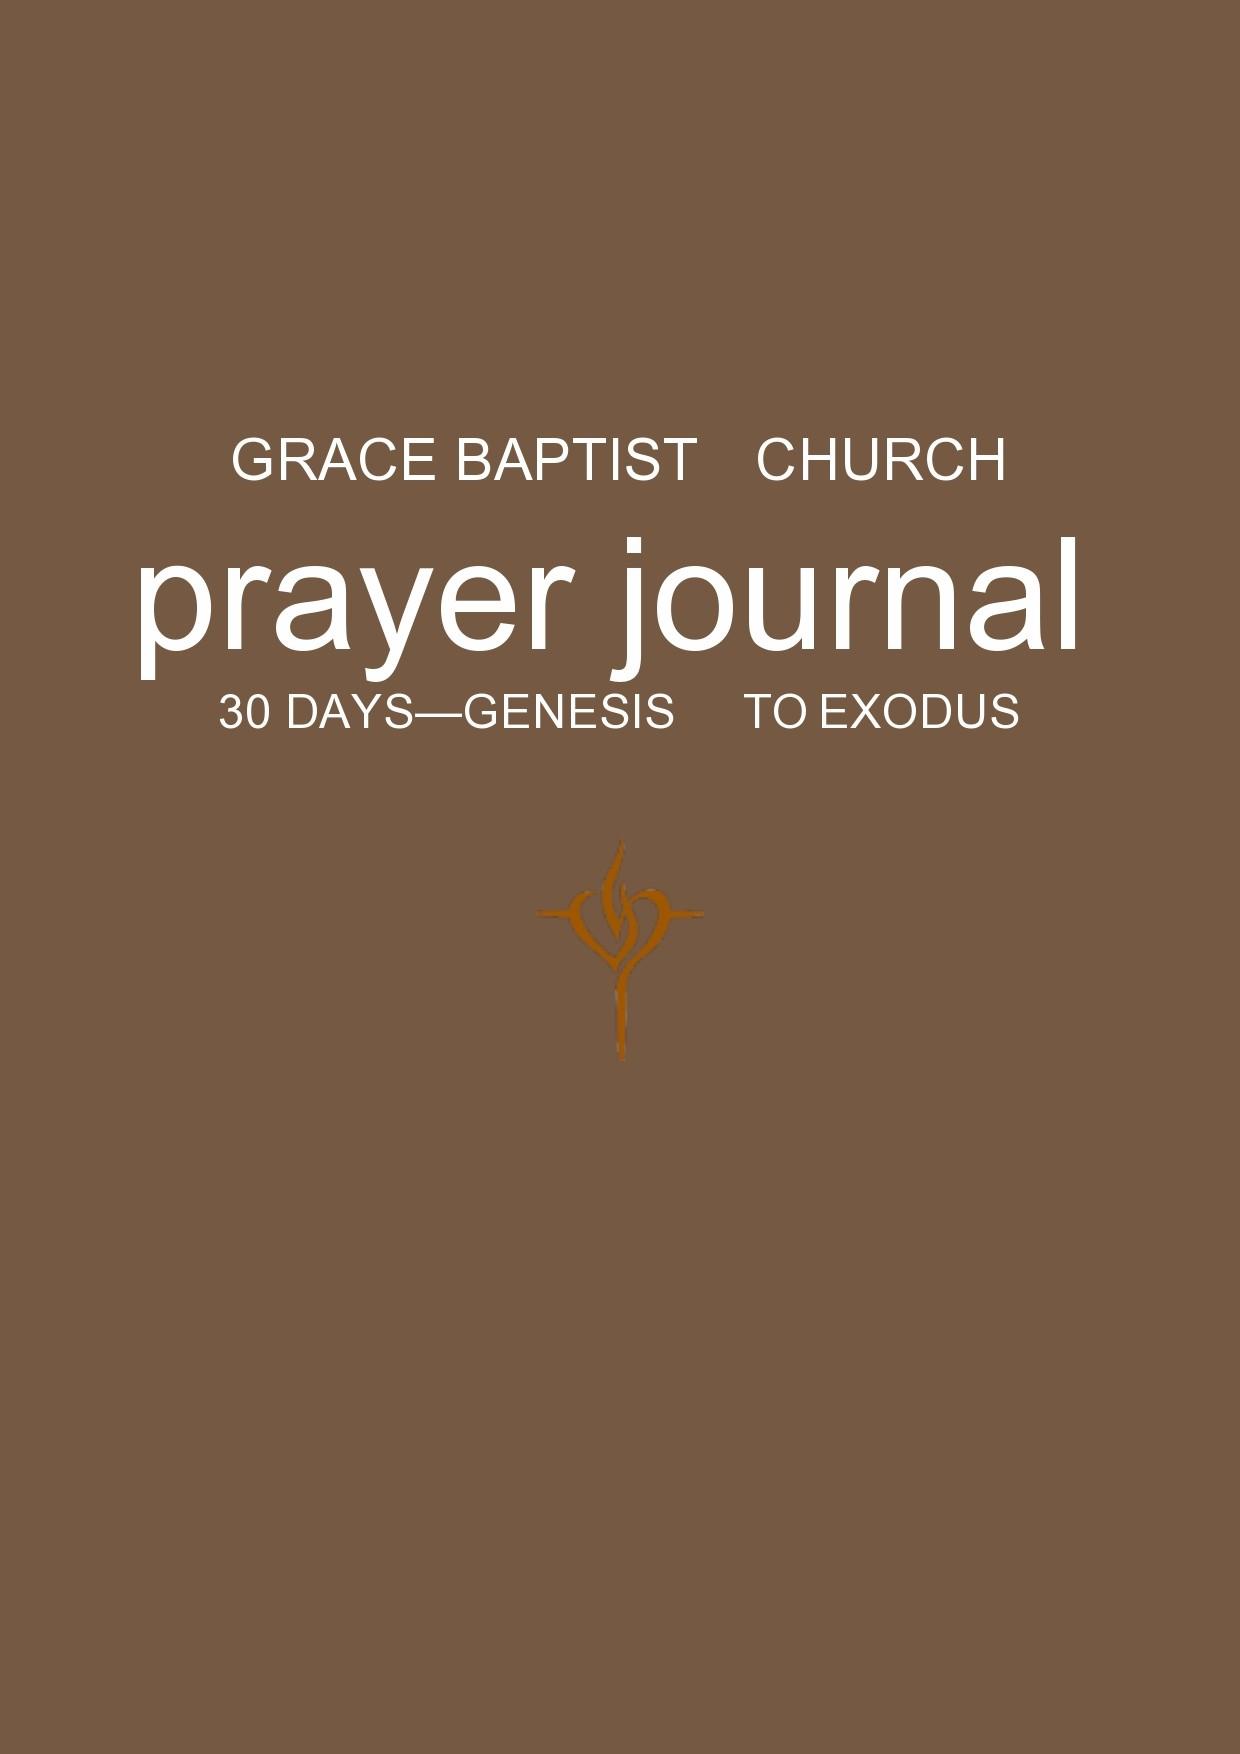 Free prayer journal template 29